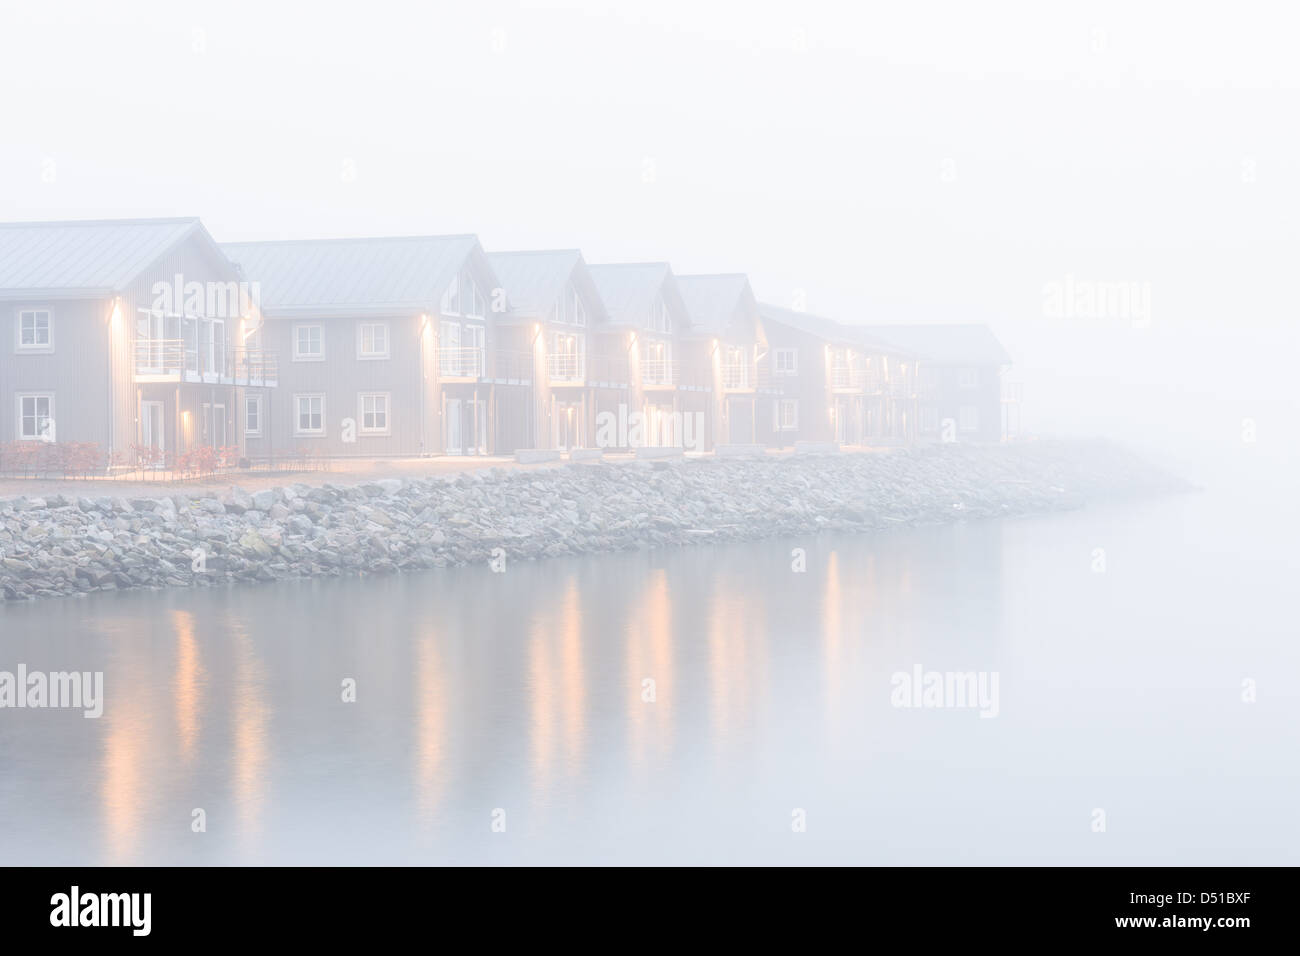 Morgennebel über See Gebäude, Nya Varvet, Göteborg, Schweden, Europa Stockbild